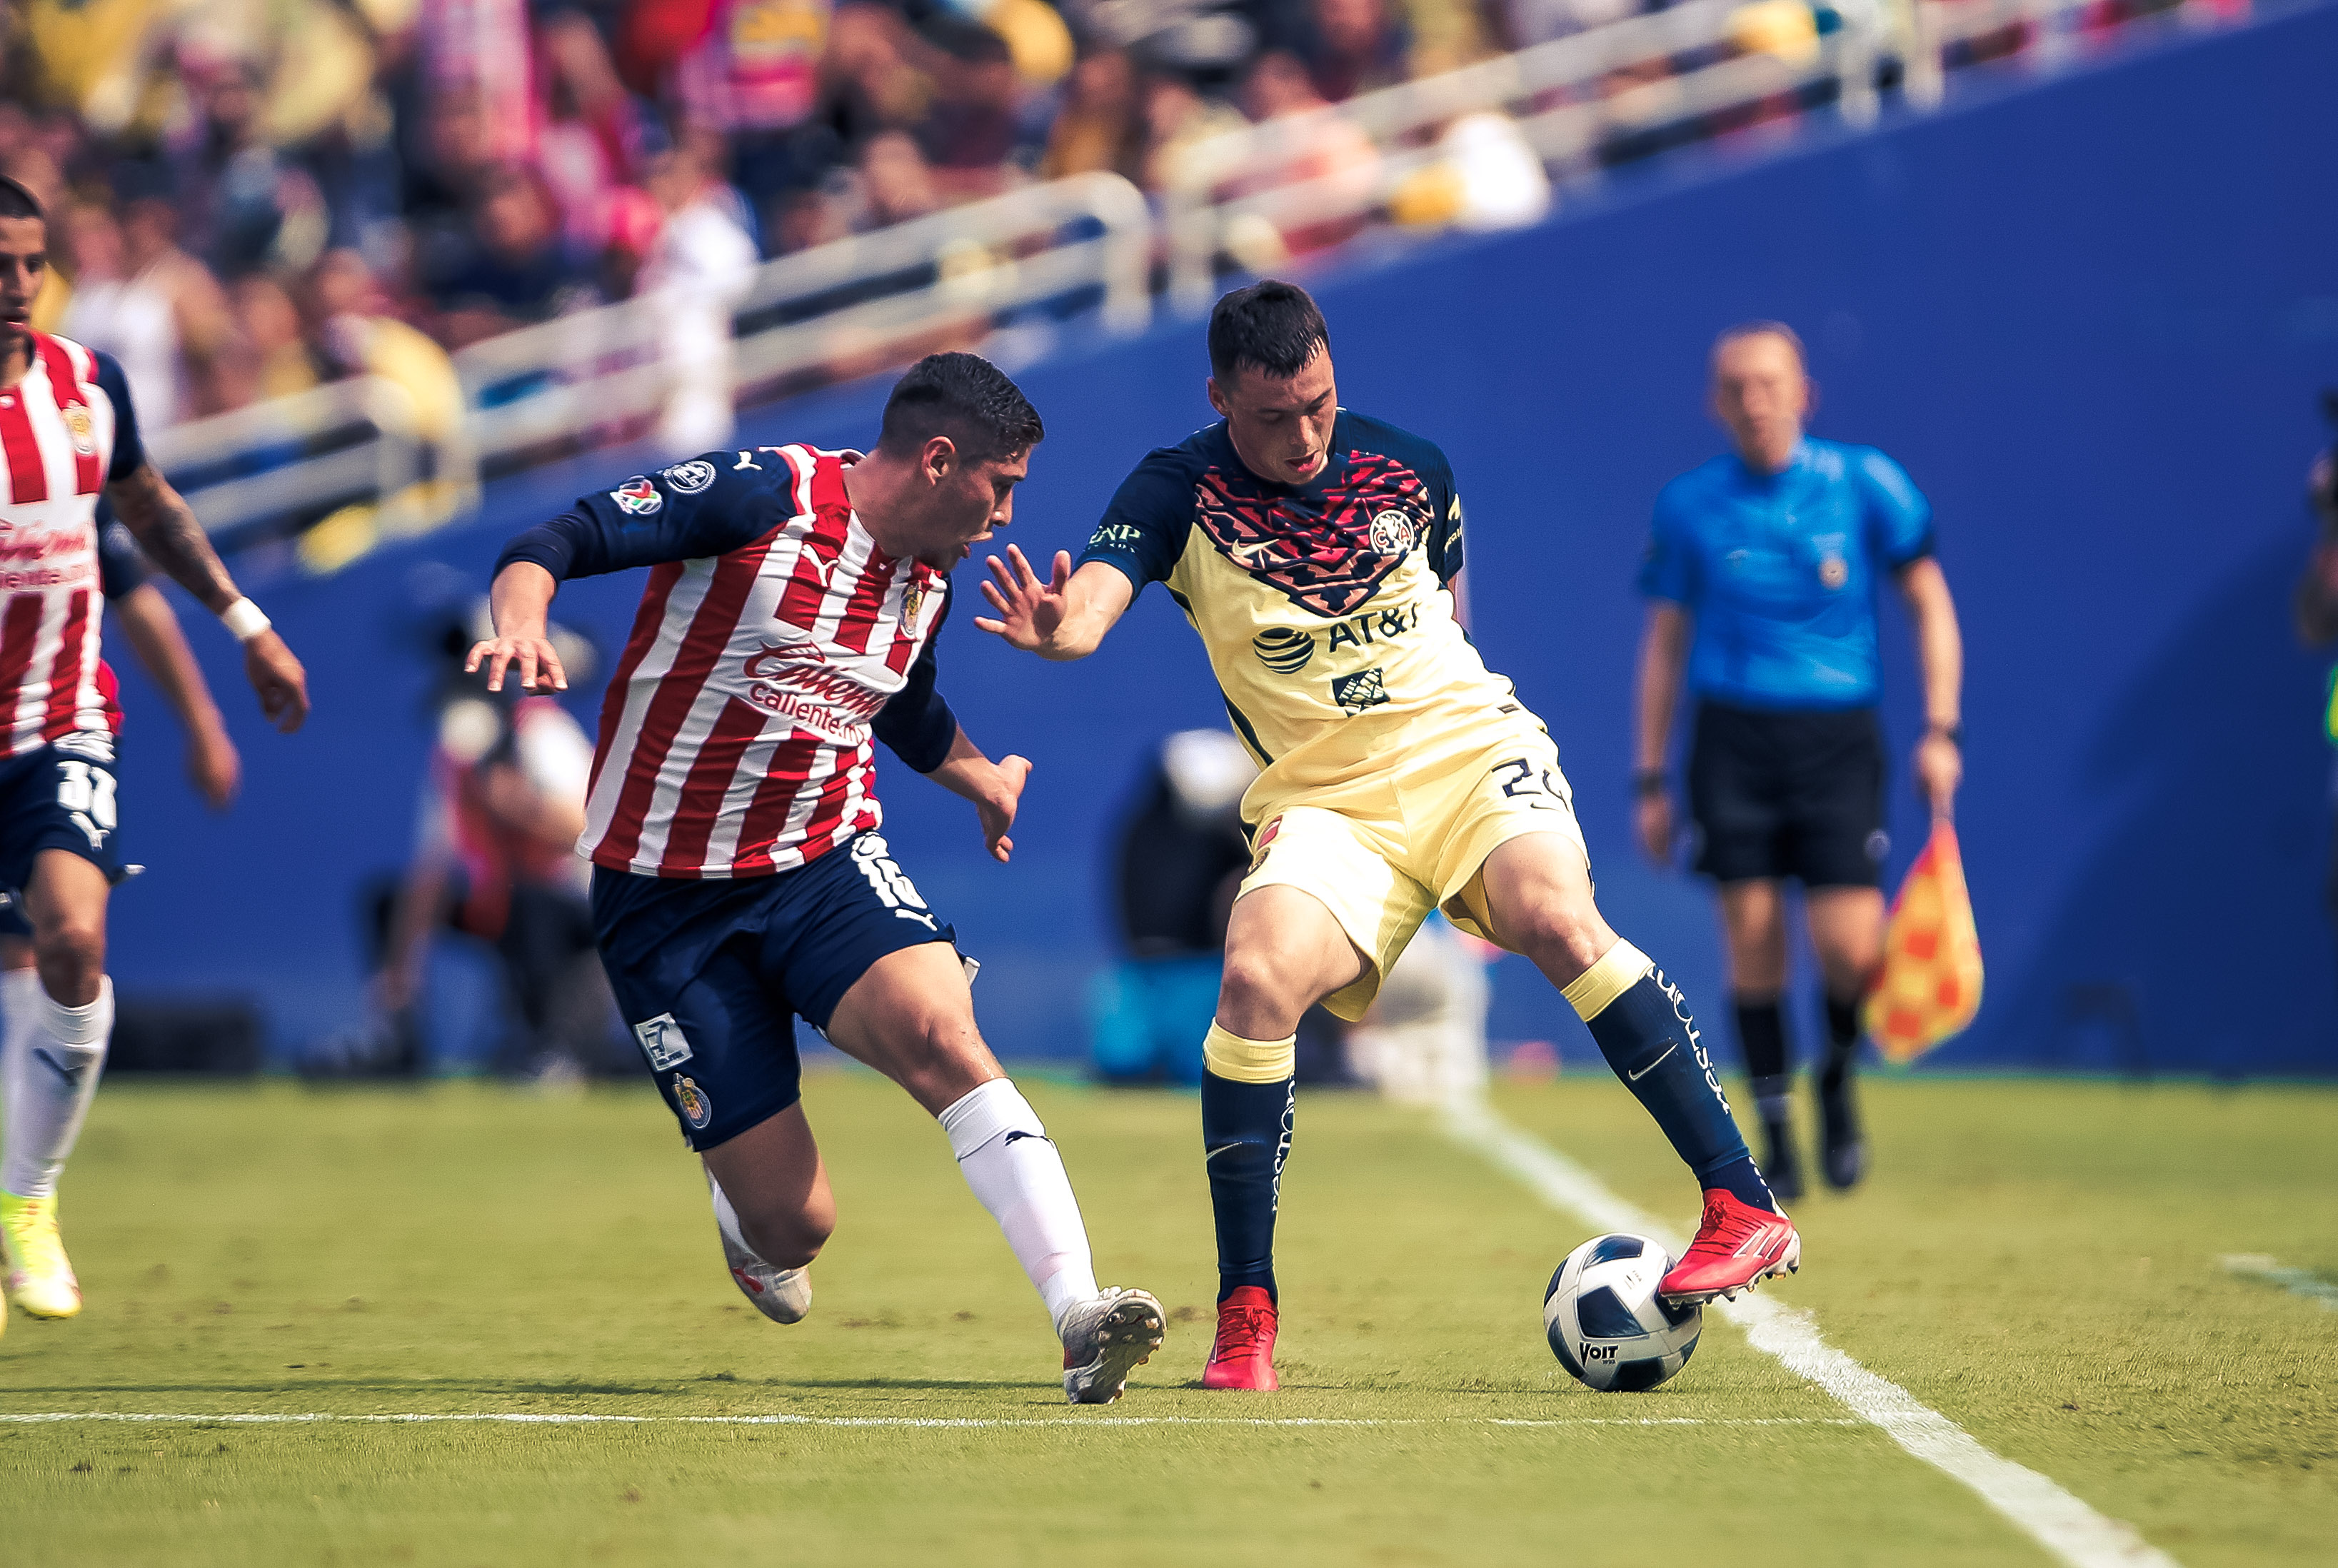 América vs Chivas 2-0 Amistoso Super Clásico USA 2021